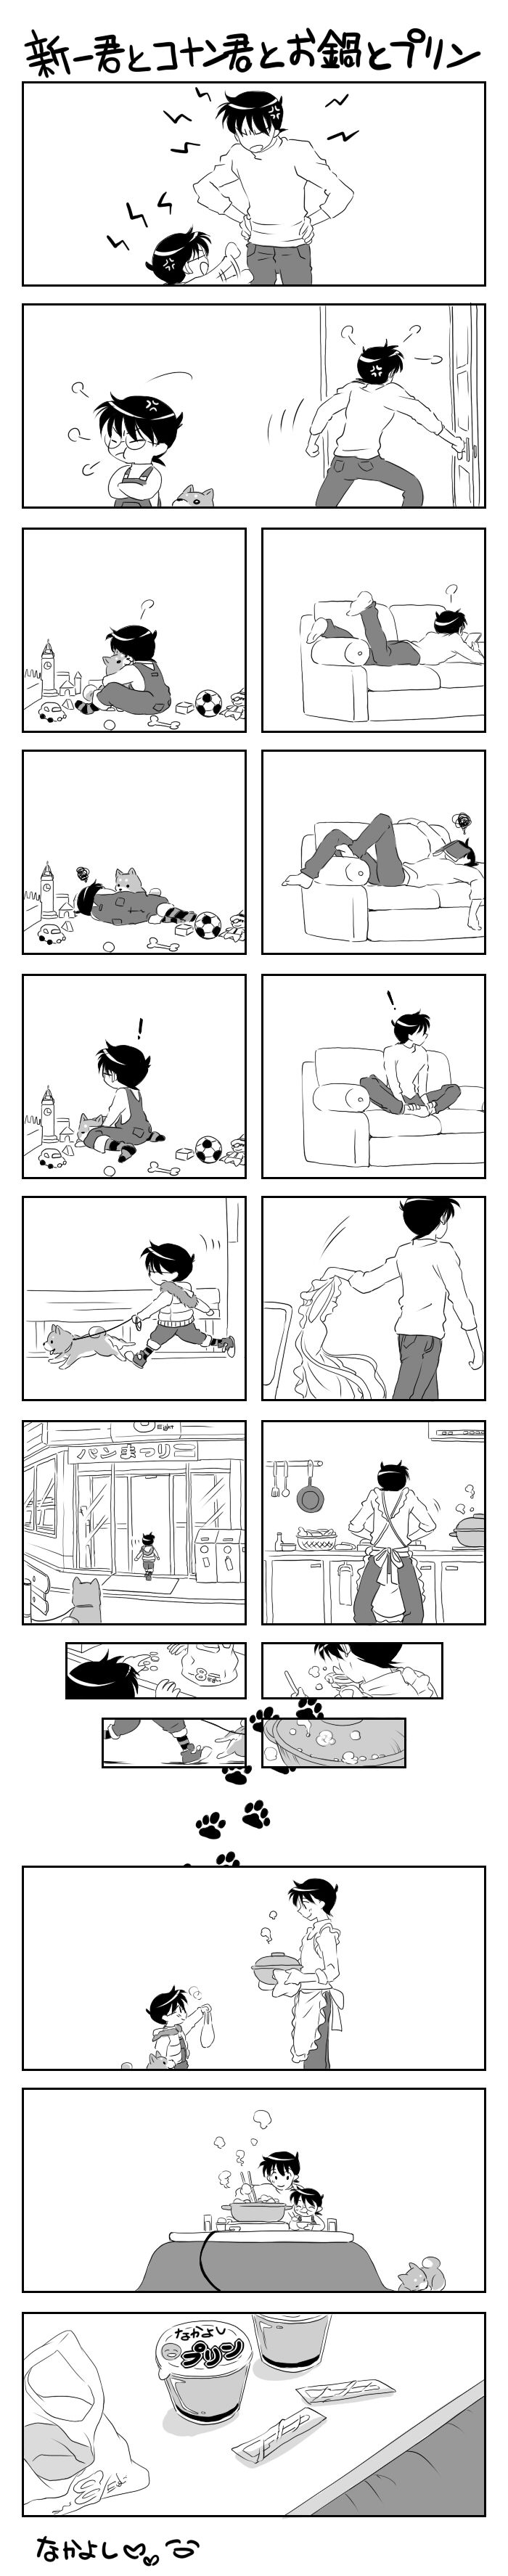 Shin-chan and Conan-kun~